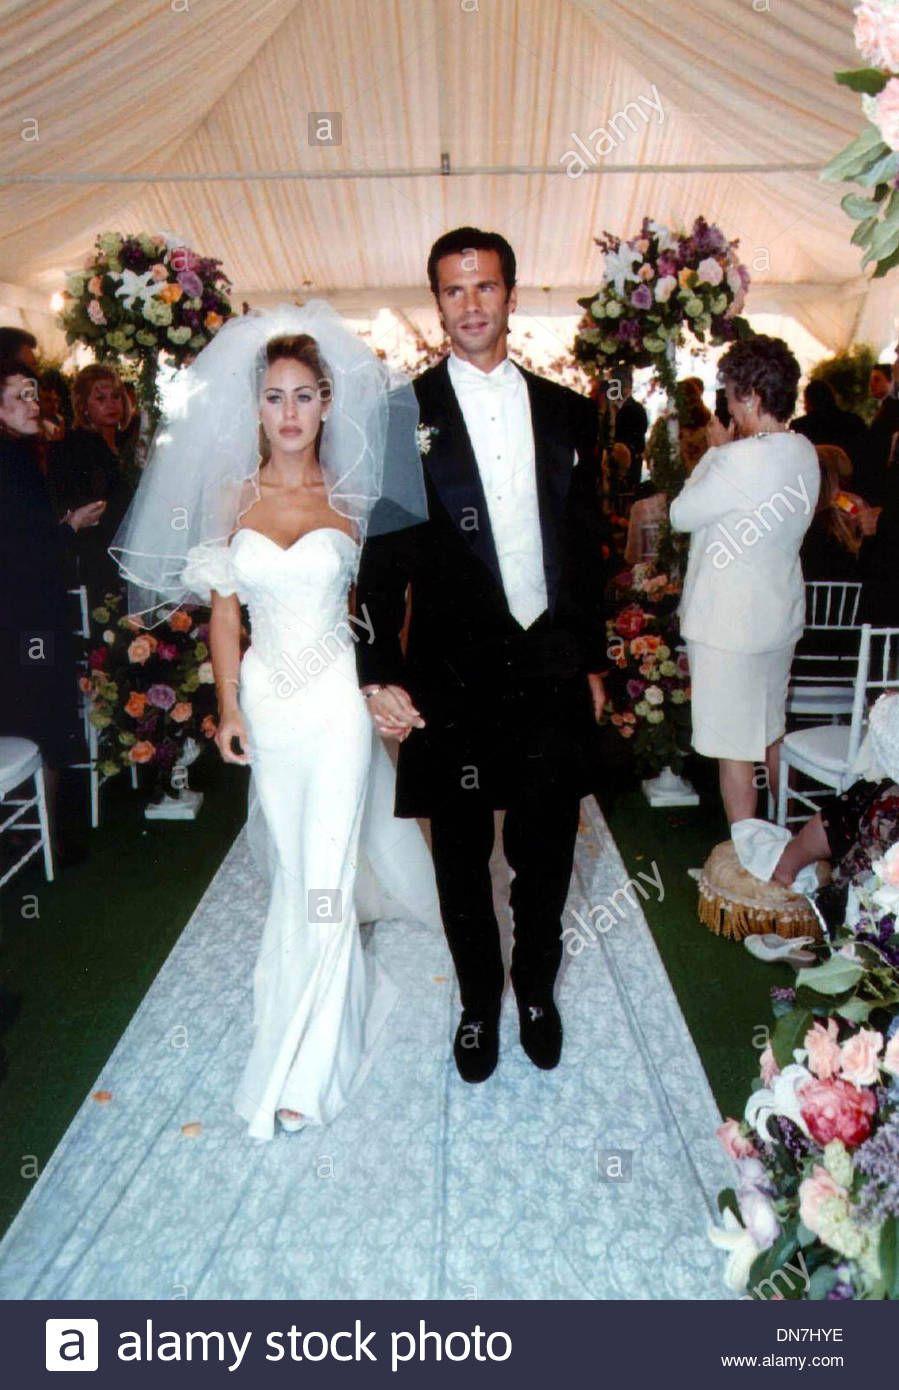 Hollywood celebrity weddings 2019 corvette